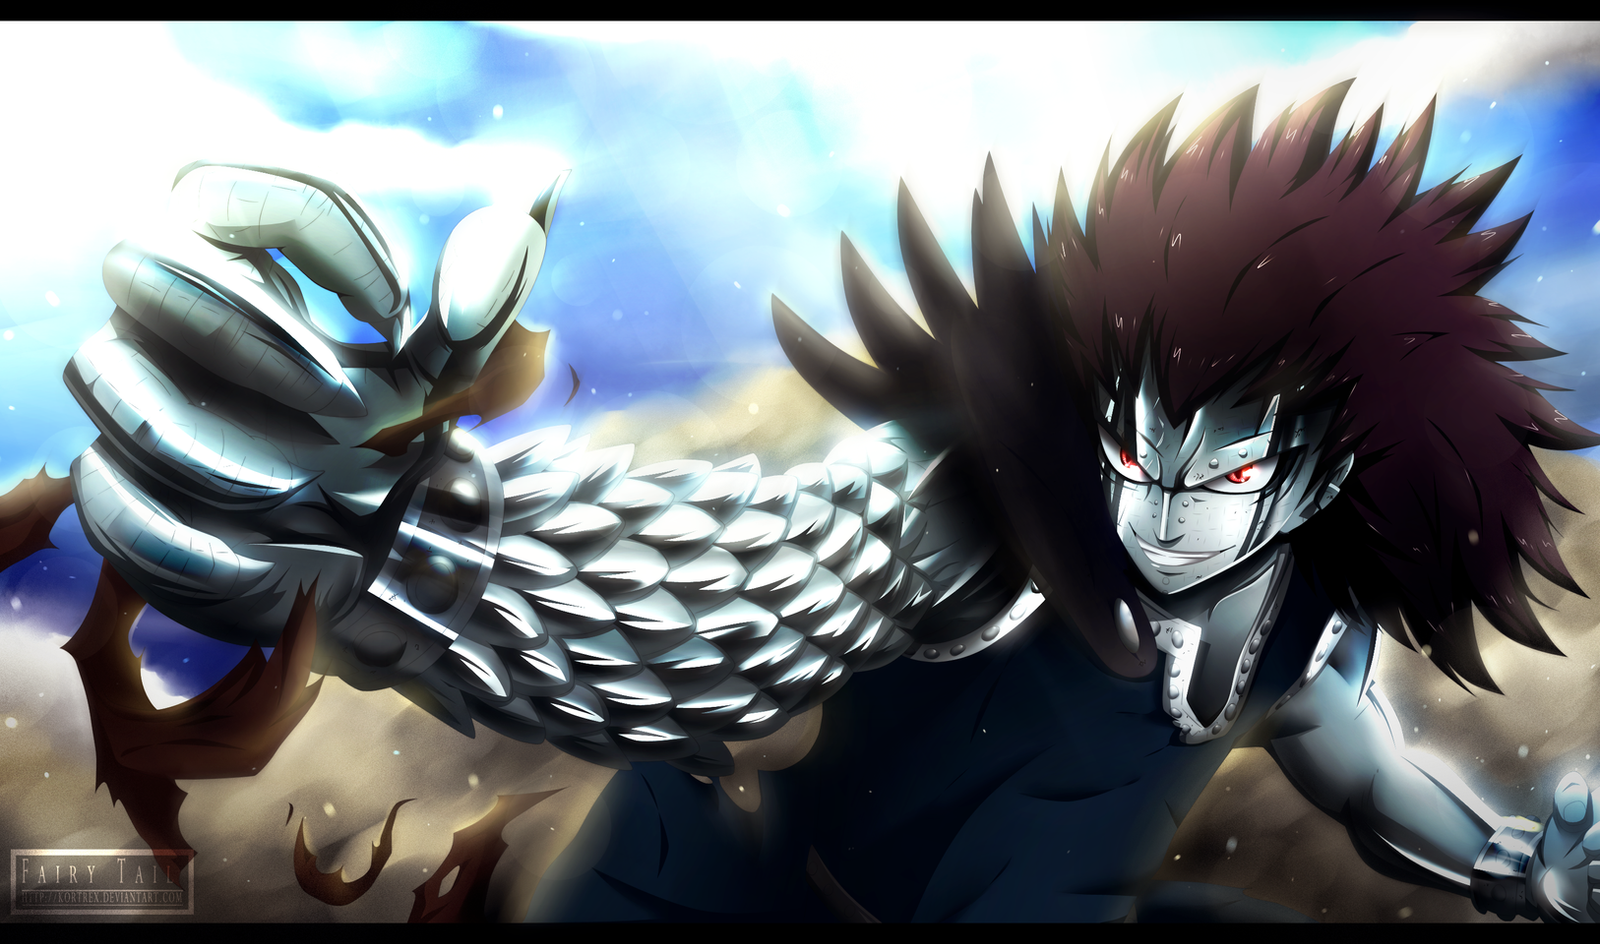 Gajeel Redfox Dragonforce